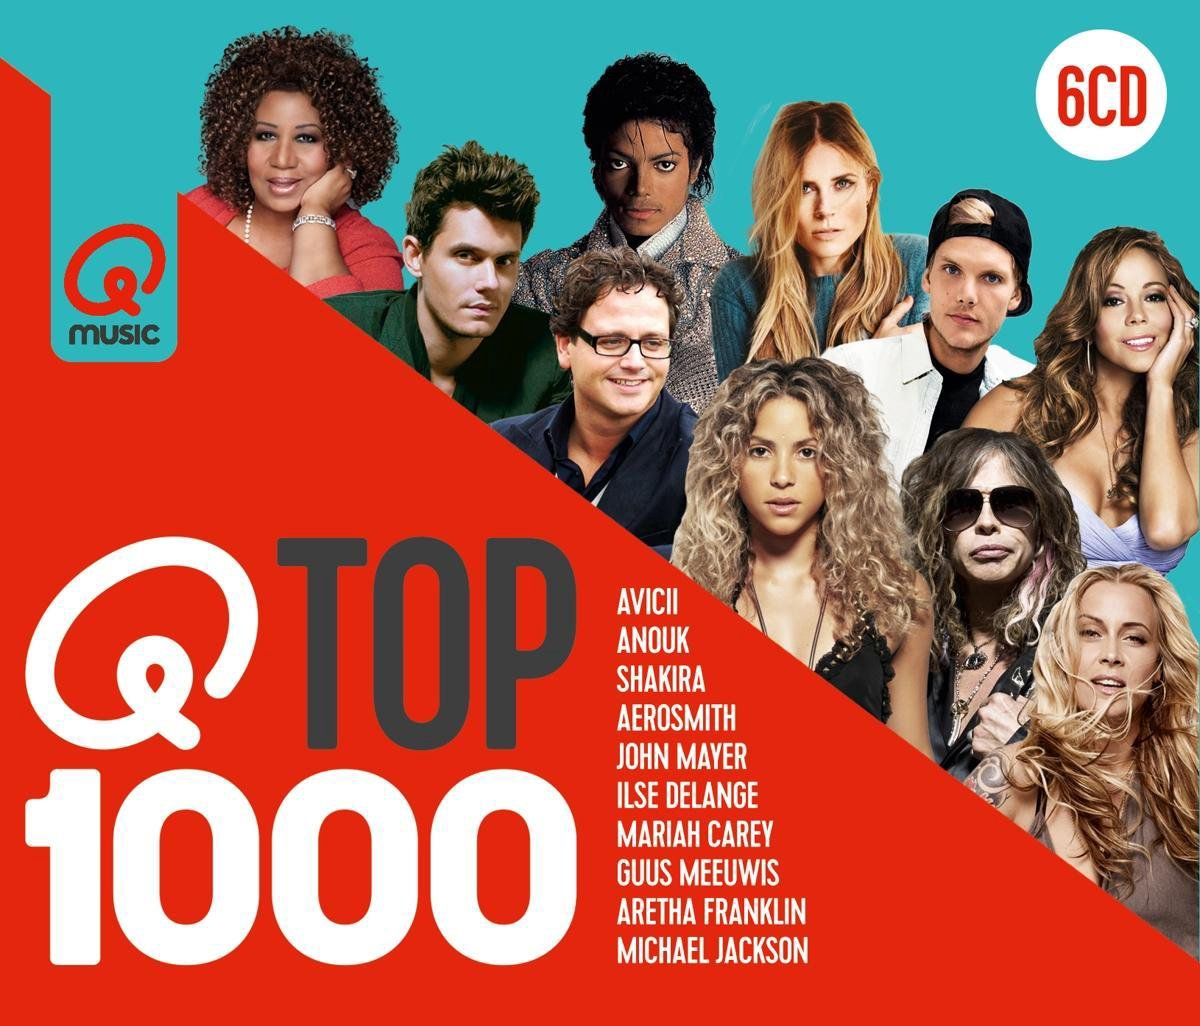 Qmusic Top 1000 (2019) - Qmusic (NL)